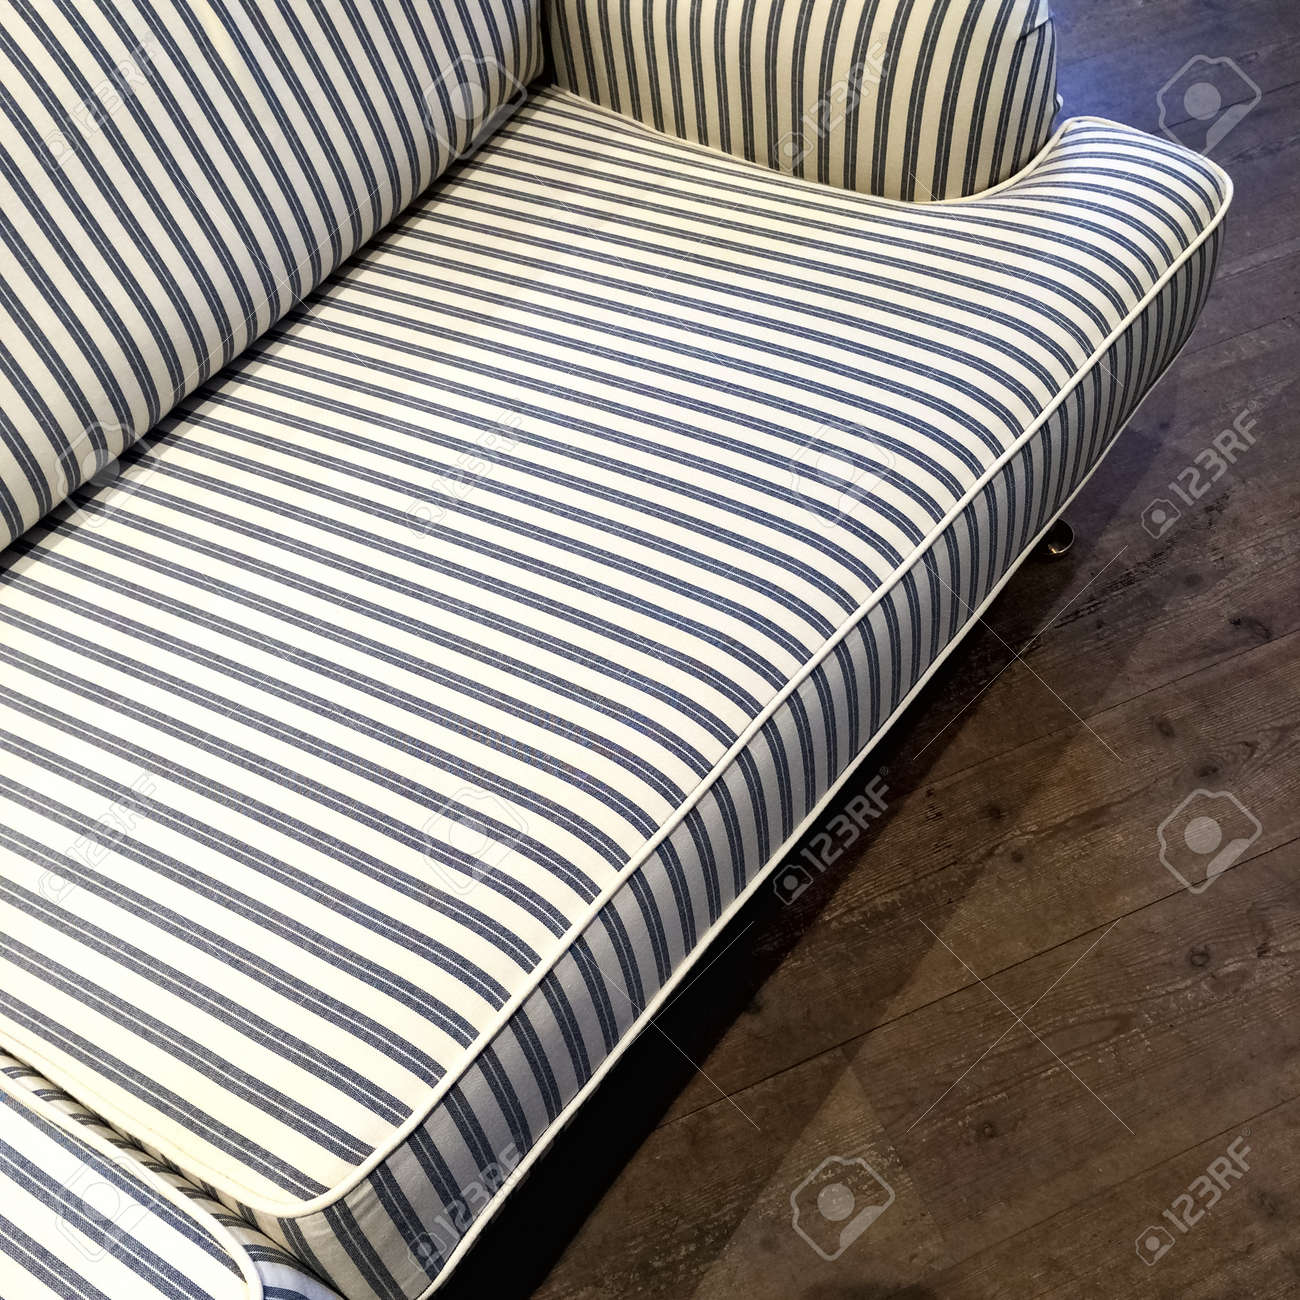 Beau Elegant Blue And White Striped Sofa On Dark Wooden Floor. Stock Photo    61245778